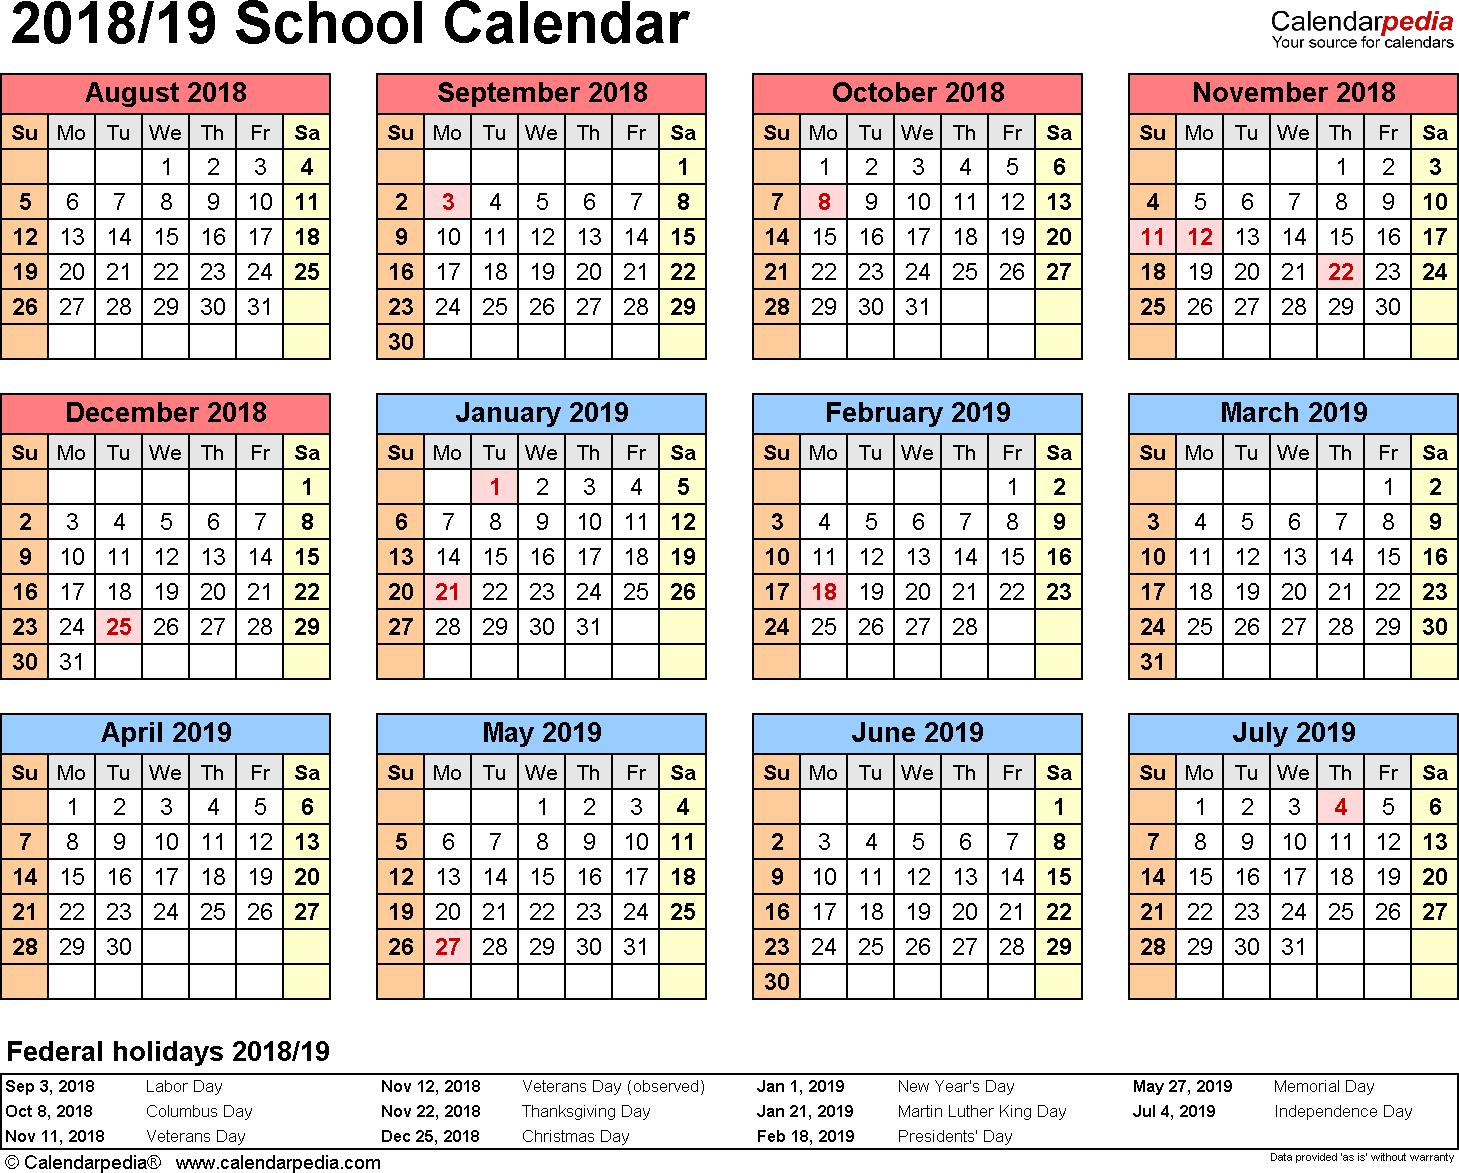 School Calendars 2018/2019 As Free Printable Word Templates regarding Free School Year At A Glance 2019-2020